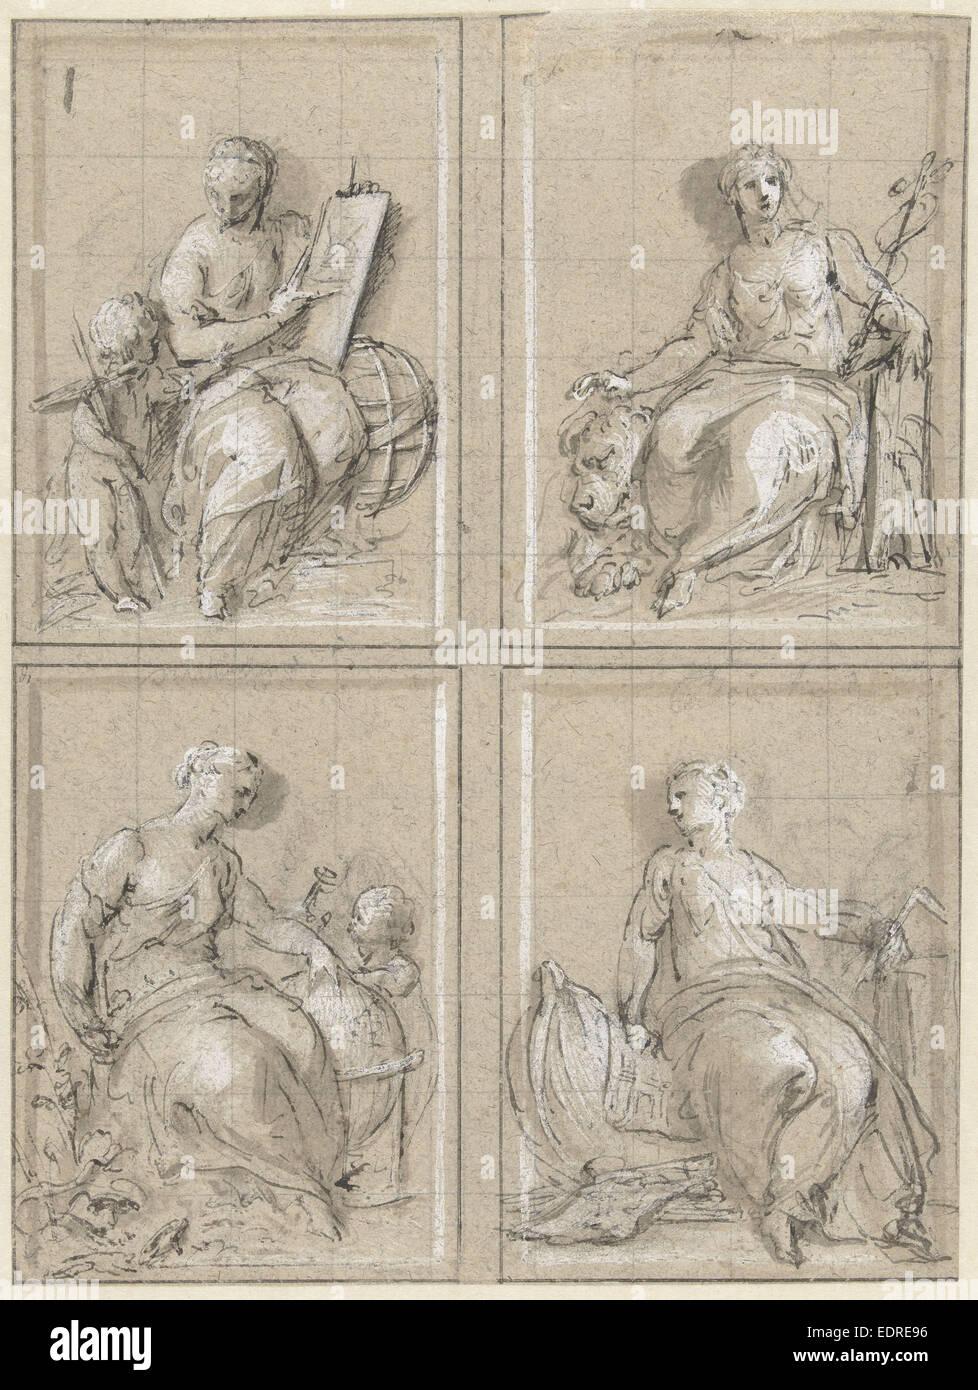 Mathematik, Commerce, Geographie und Schiffbau, Jacob de Wit, 1695-1754 Stockbild